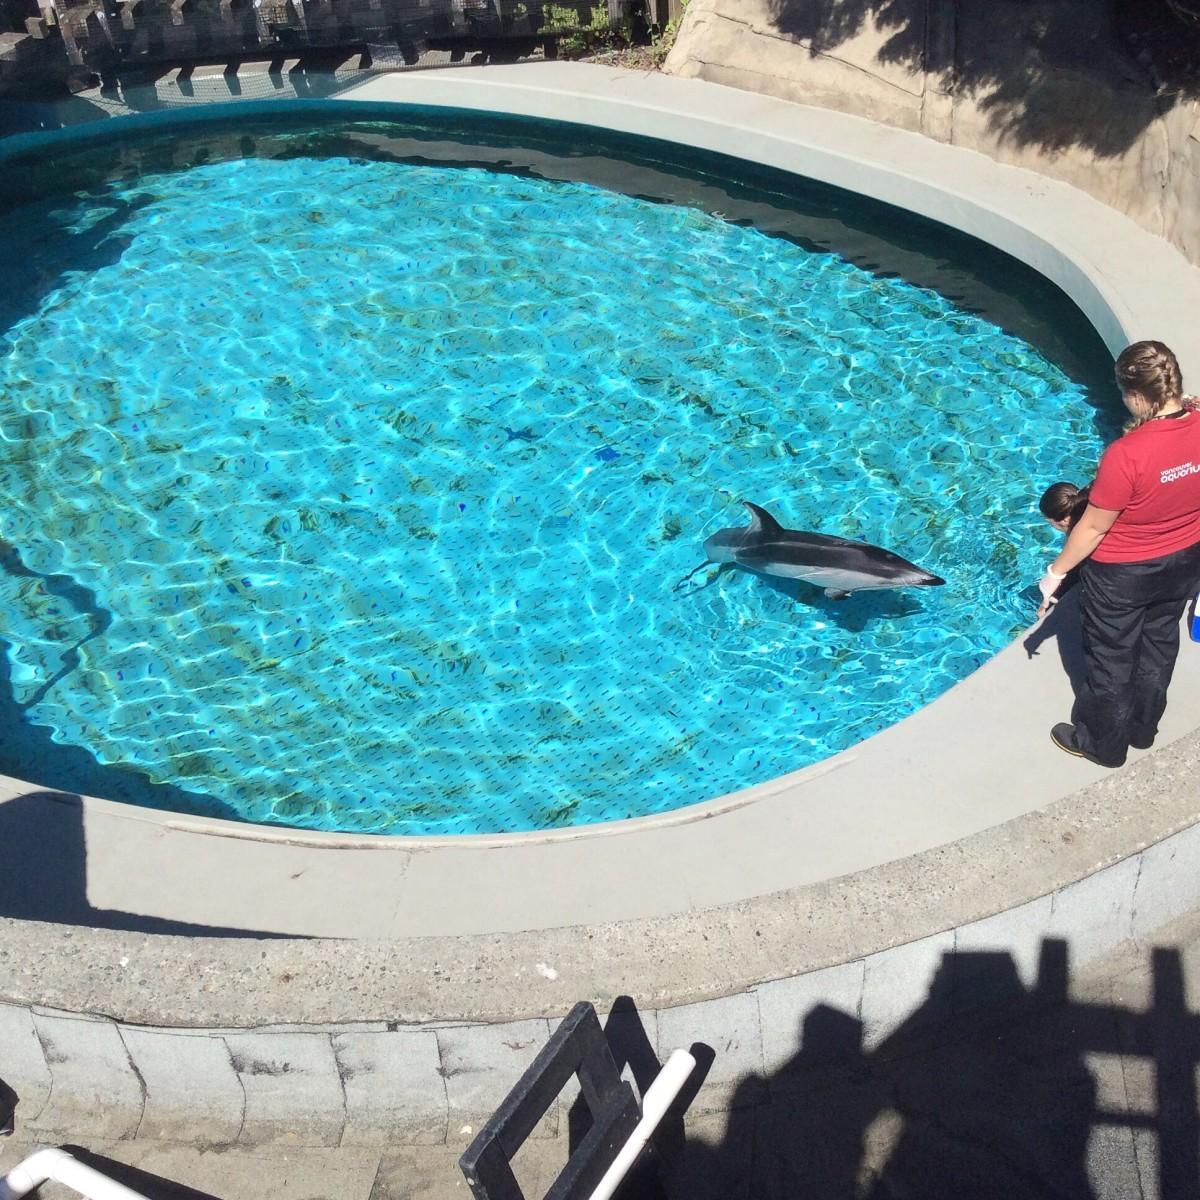 Aquarium staff talk to Helen after Hana's death